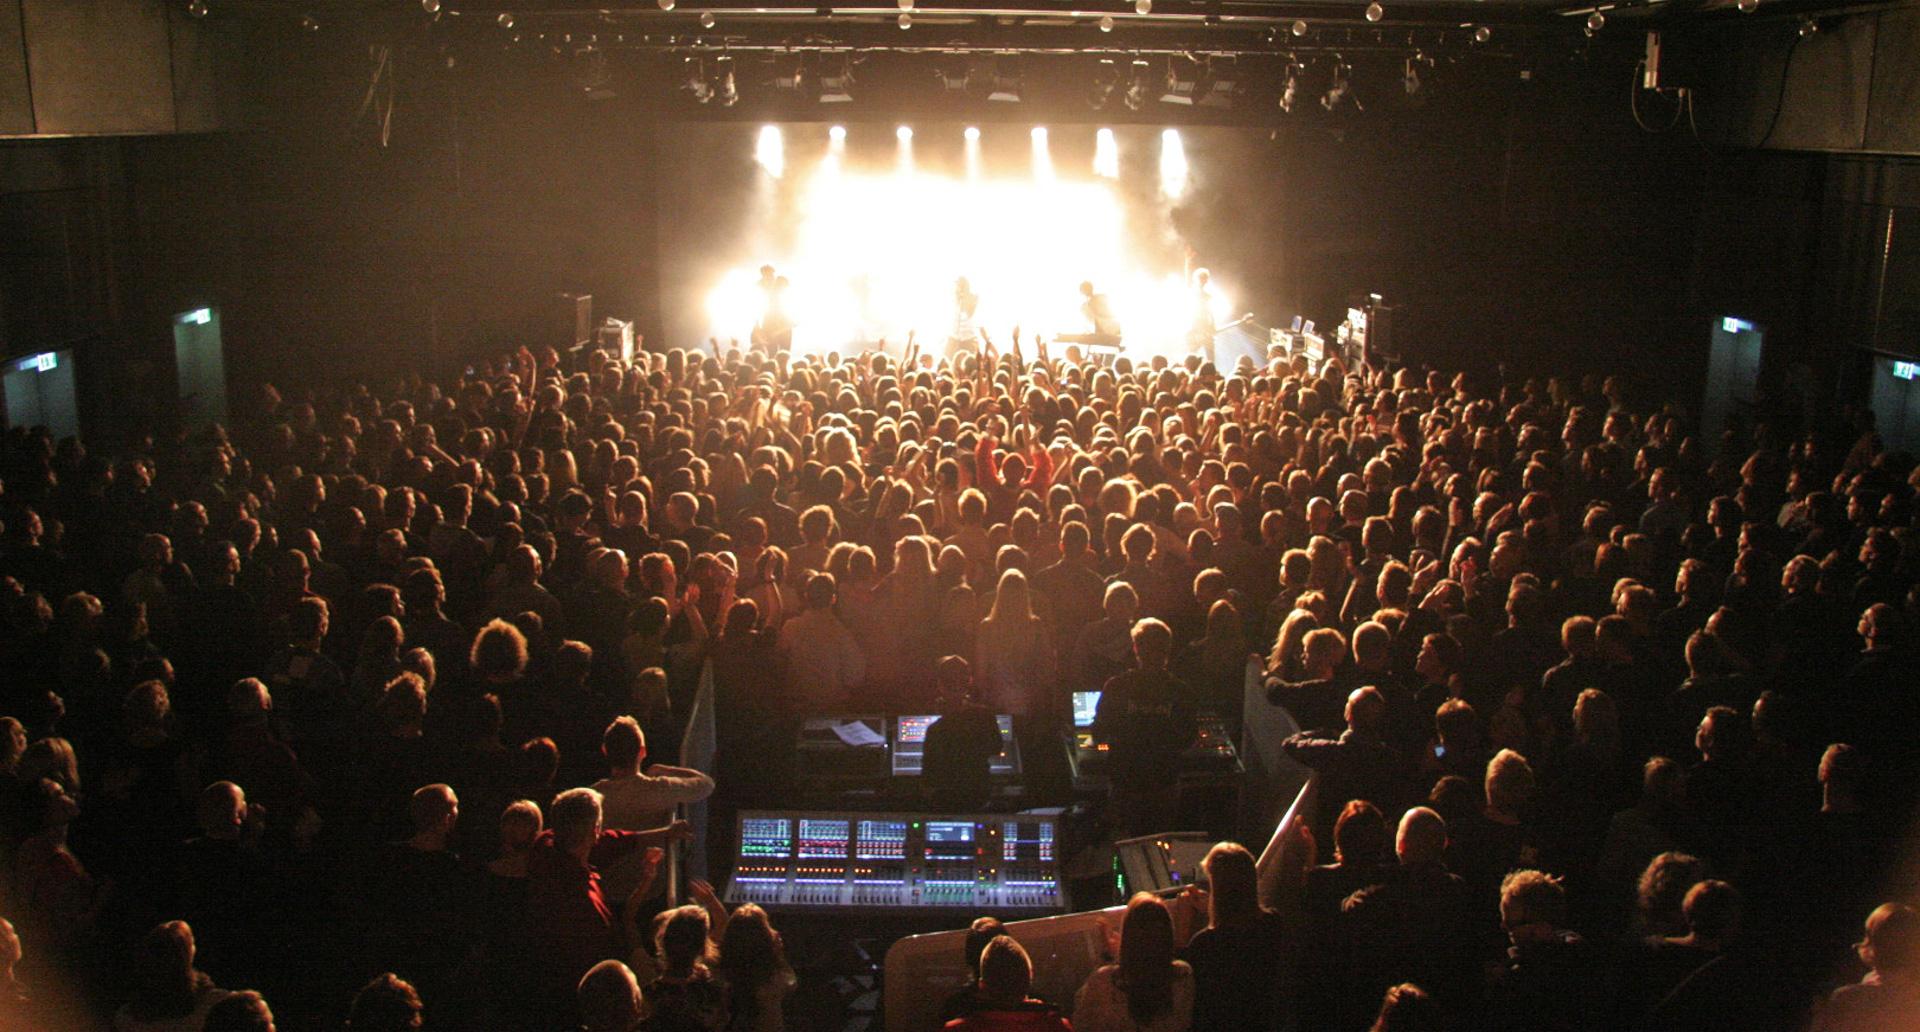 Nyt rekordår i Musikhuset: Vildeste musical-år og store koncertoplevelser